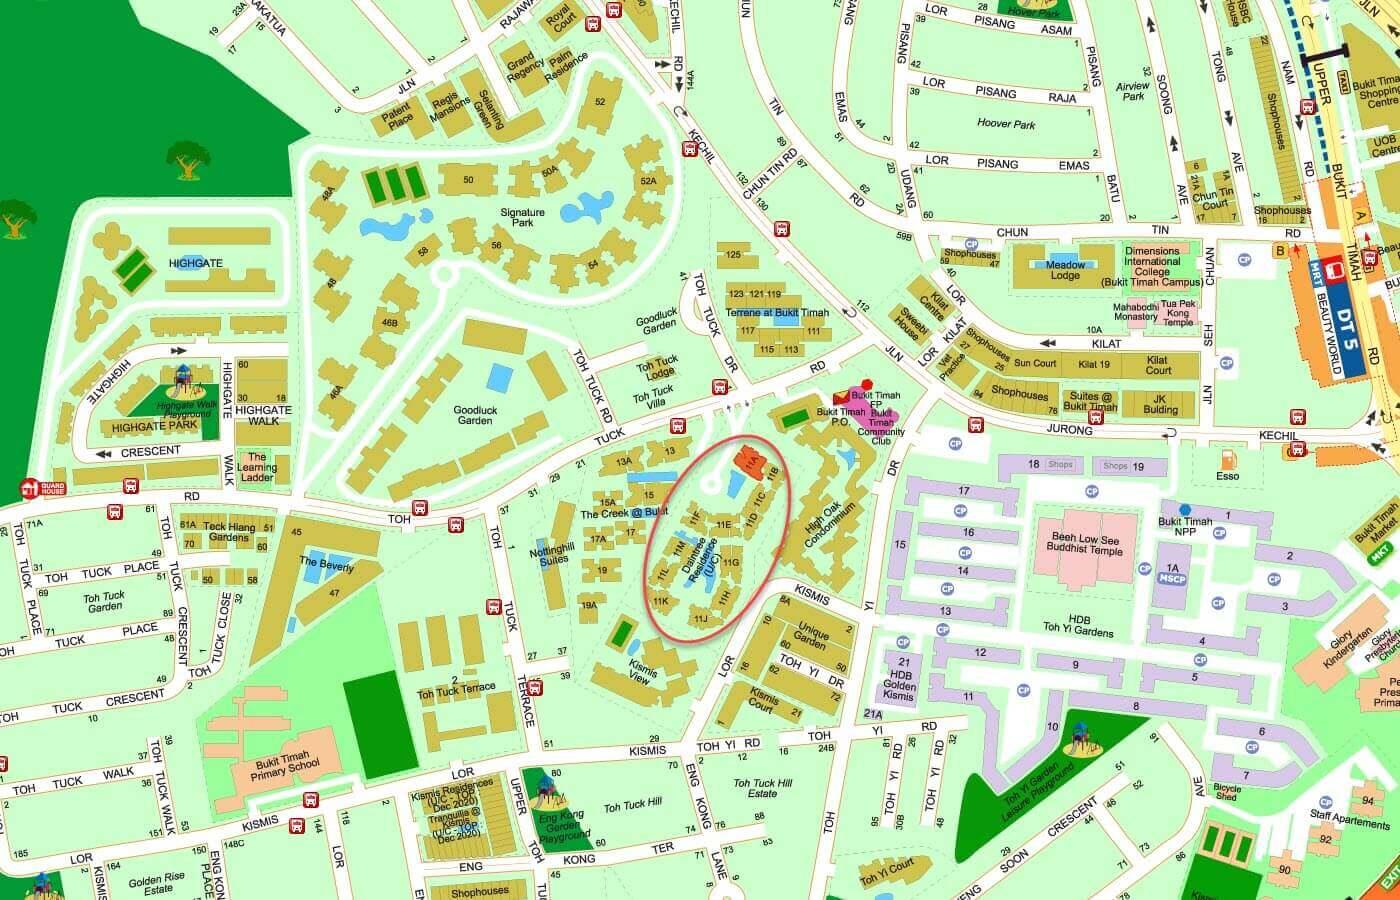 Daintree Residence Condo Street Directory Map